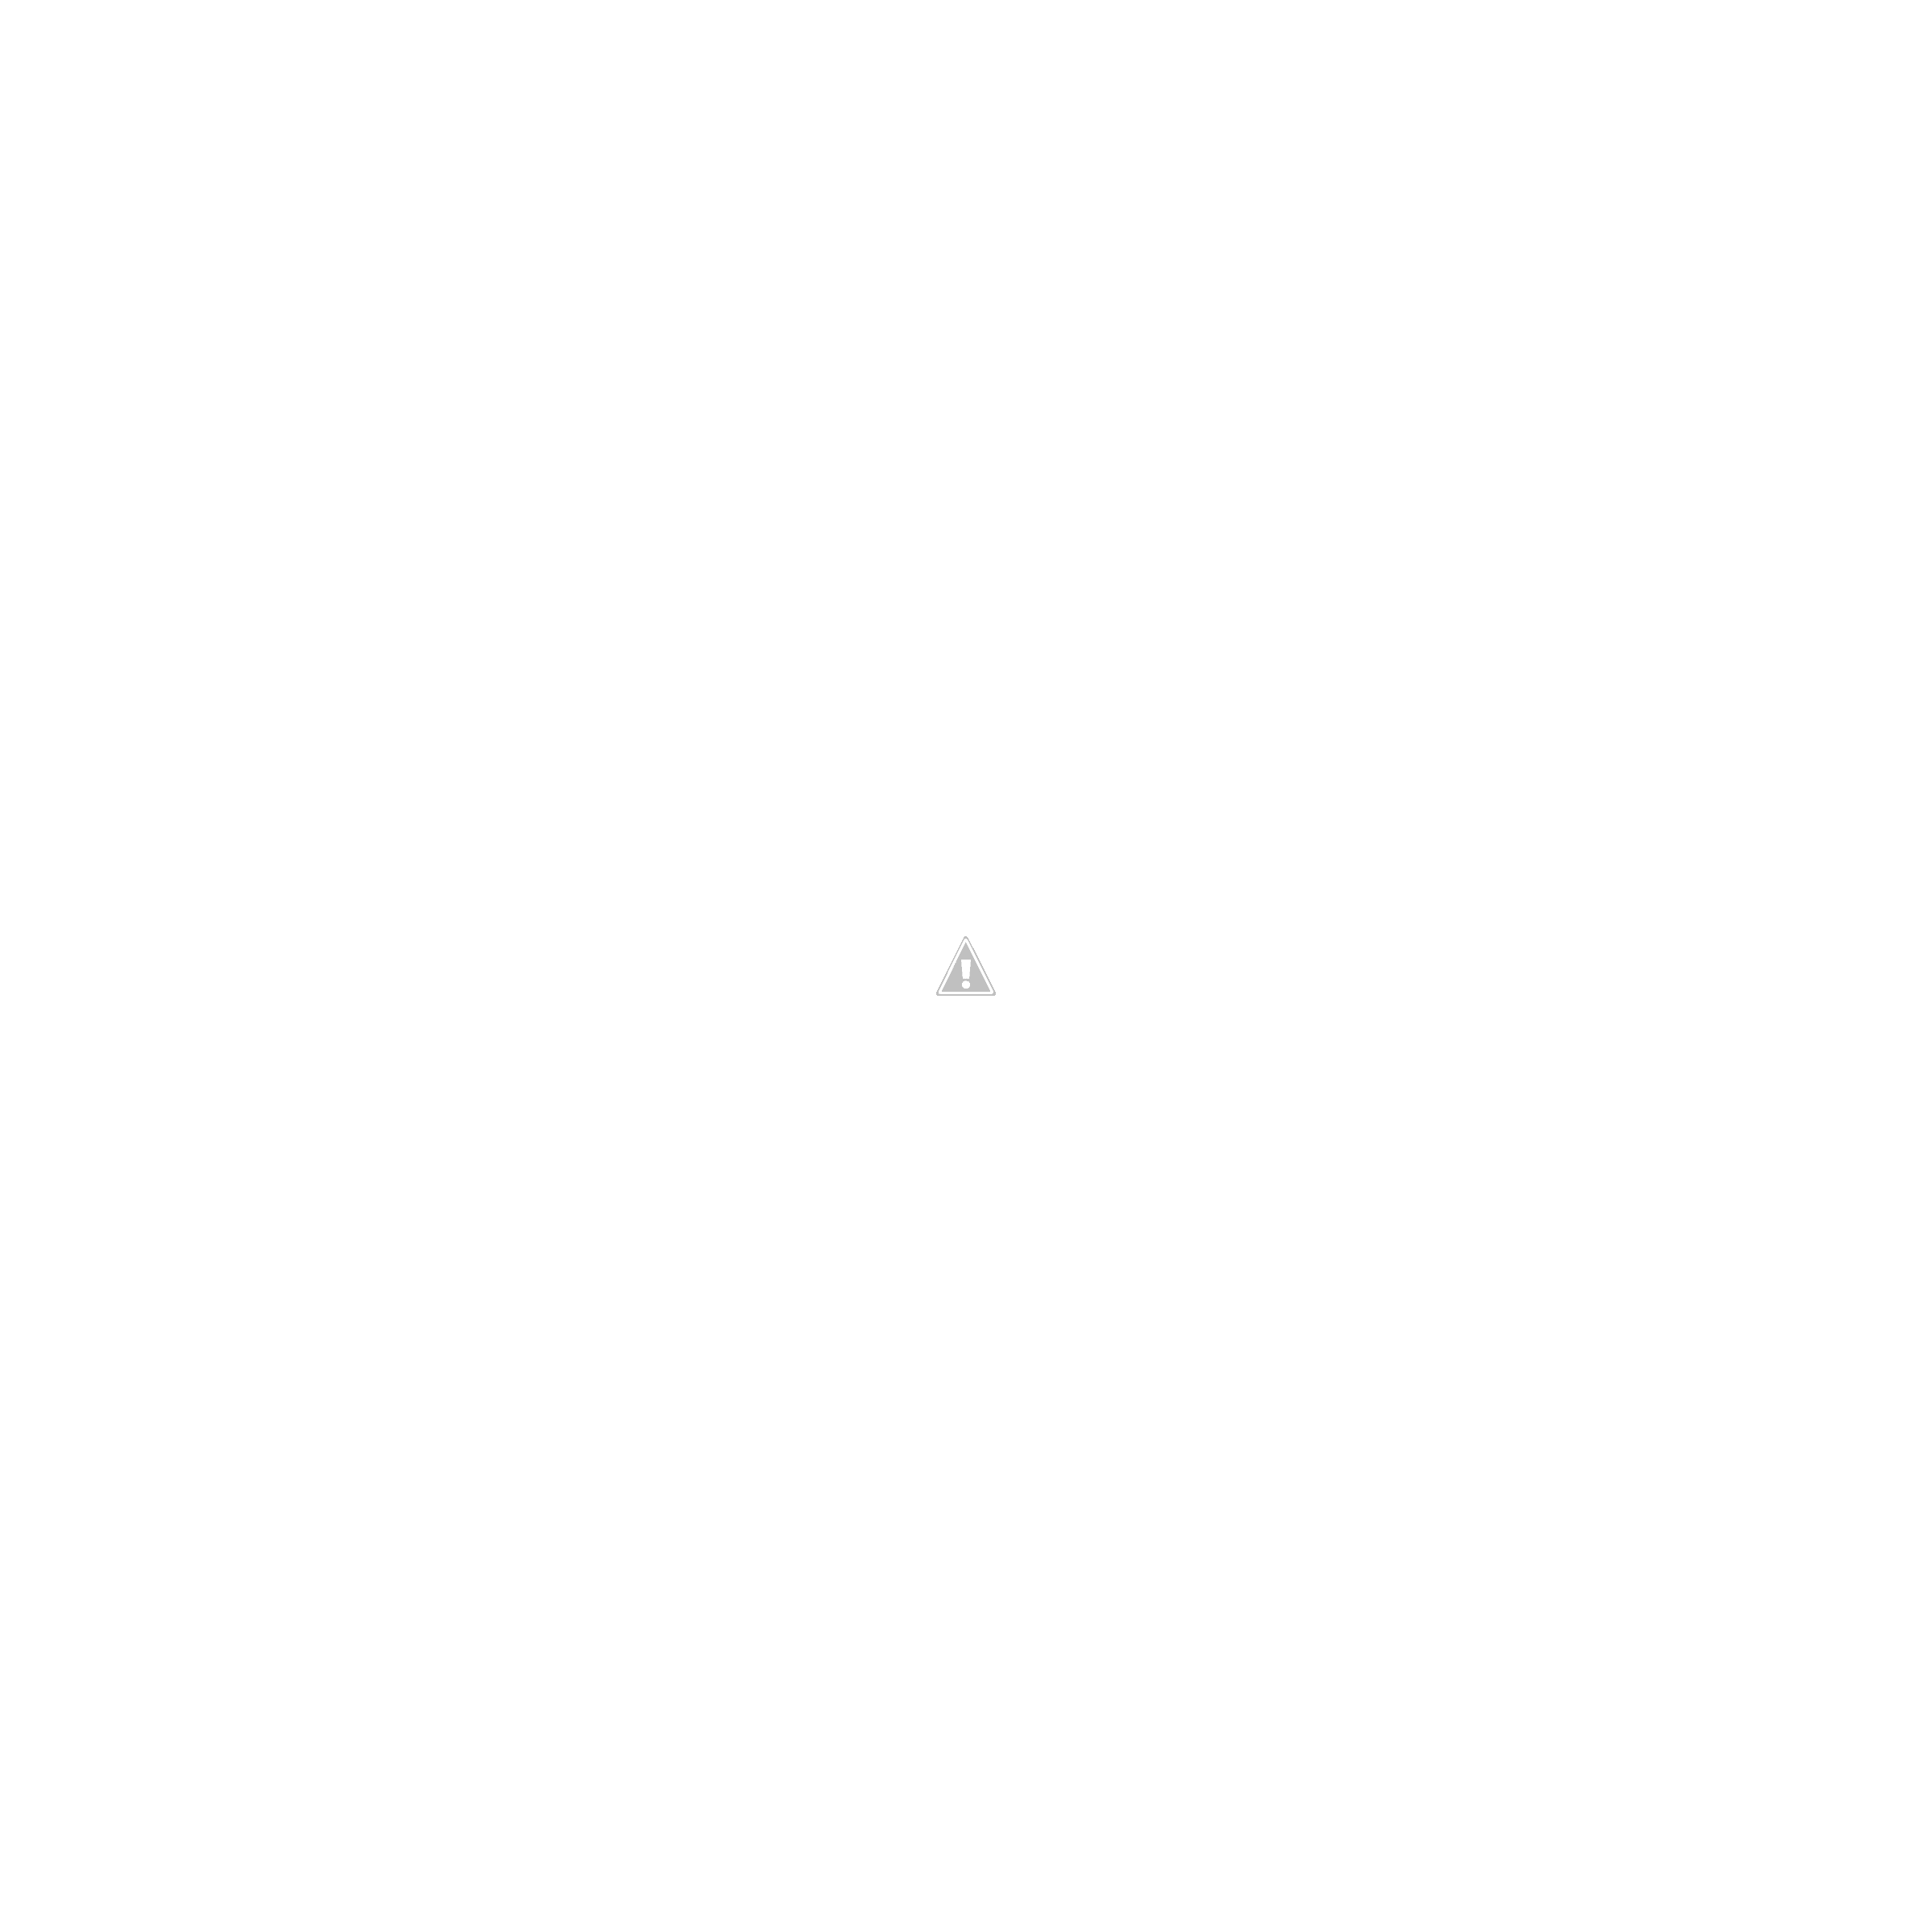 testimoni-instagram